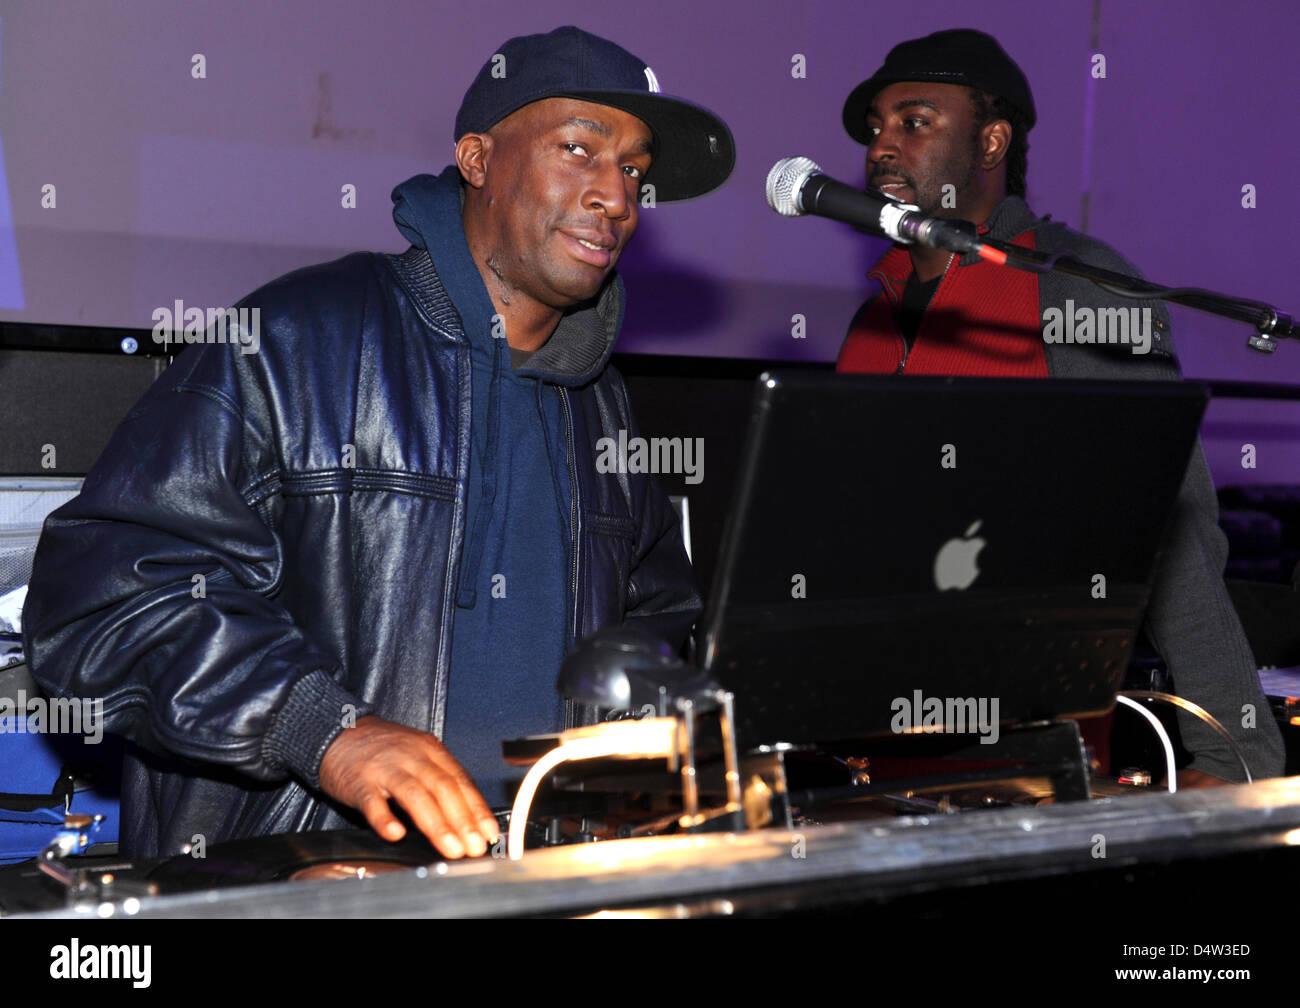 U.S. American DJ Grandmaster Flash alias Joseph Saddler pictured during the soundcheck at the noble nightclub 'P1' - Stock Image